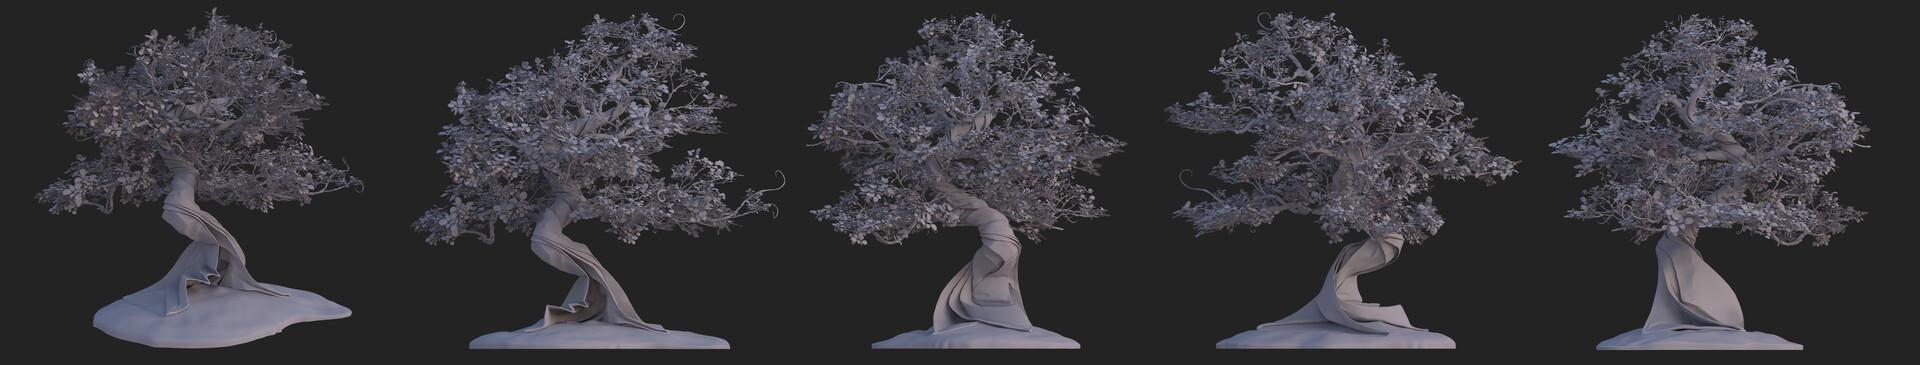 Vitaliy burov tree front lo